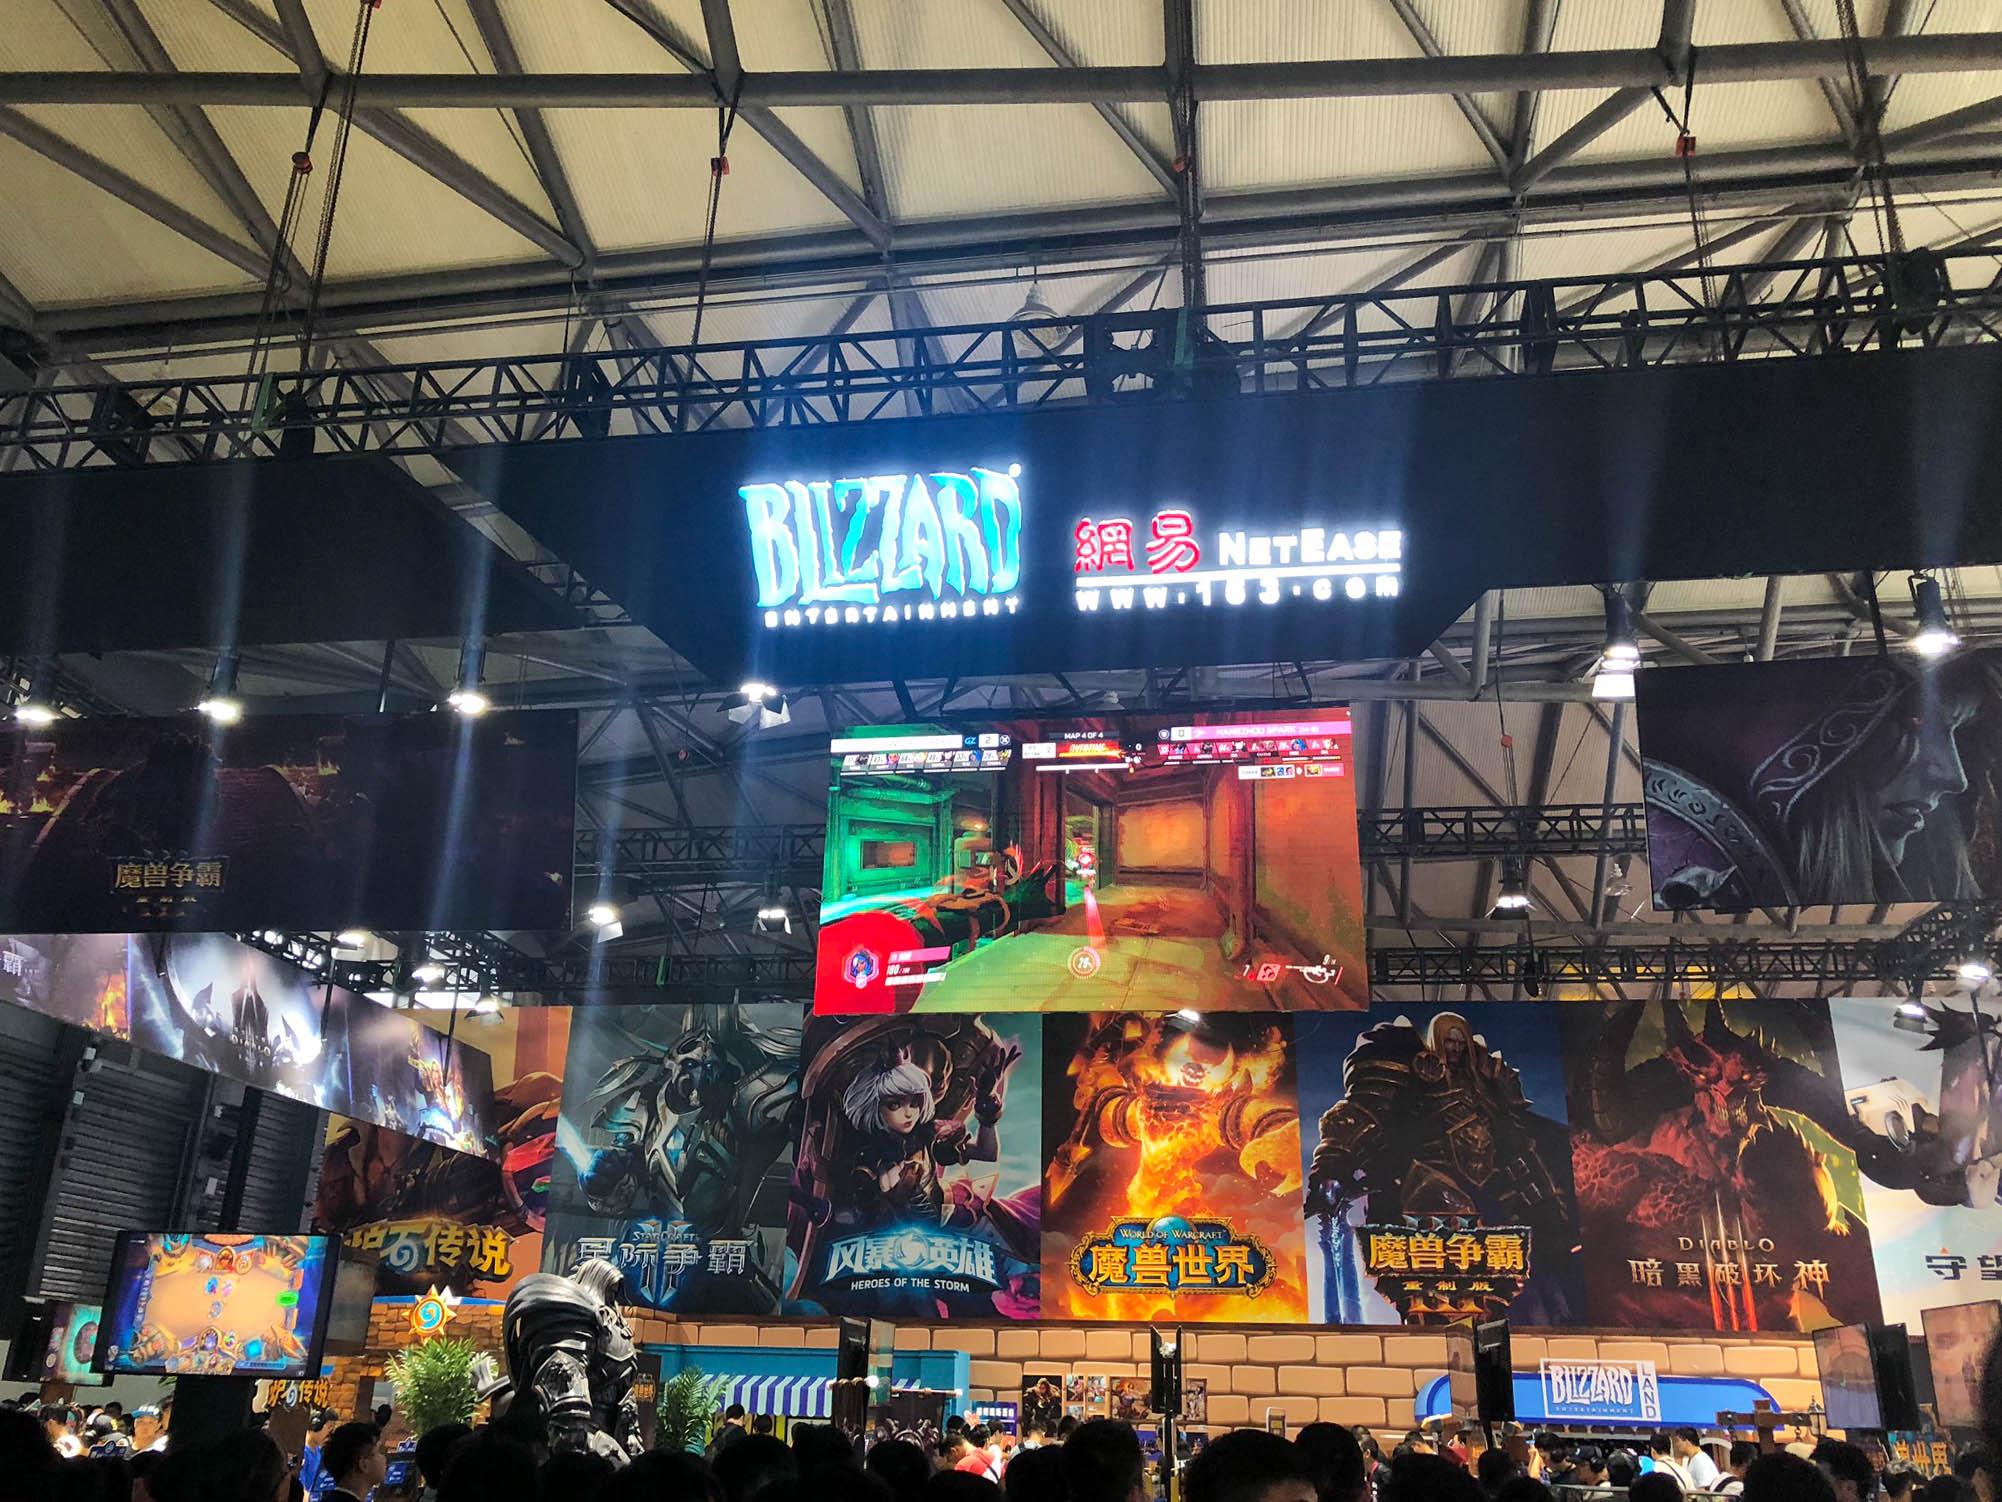 2019 ChinaJoy 中国国际数码互动娱乐展览会 游玩 第51张